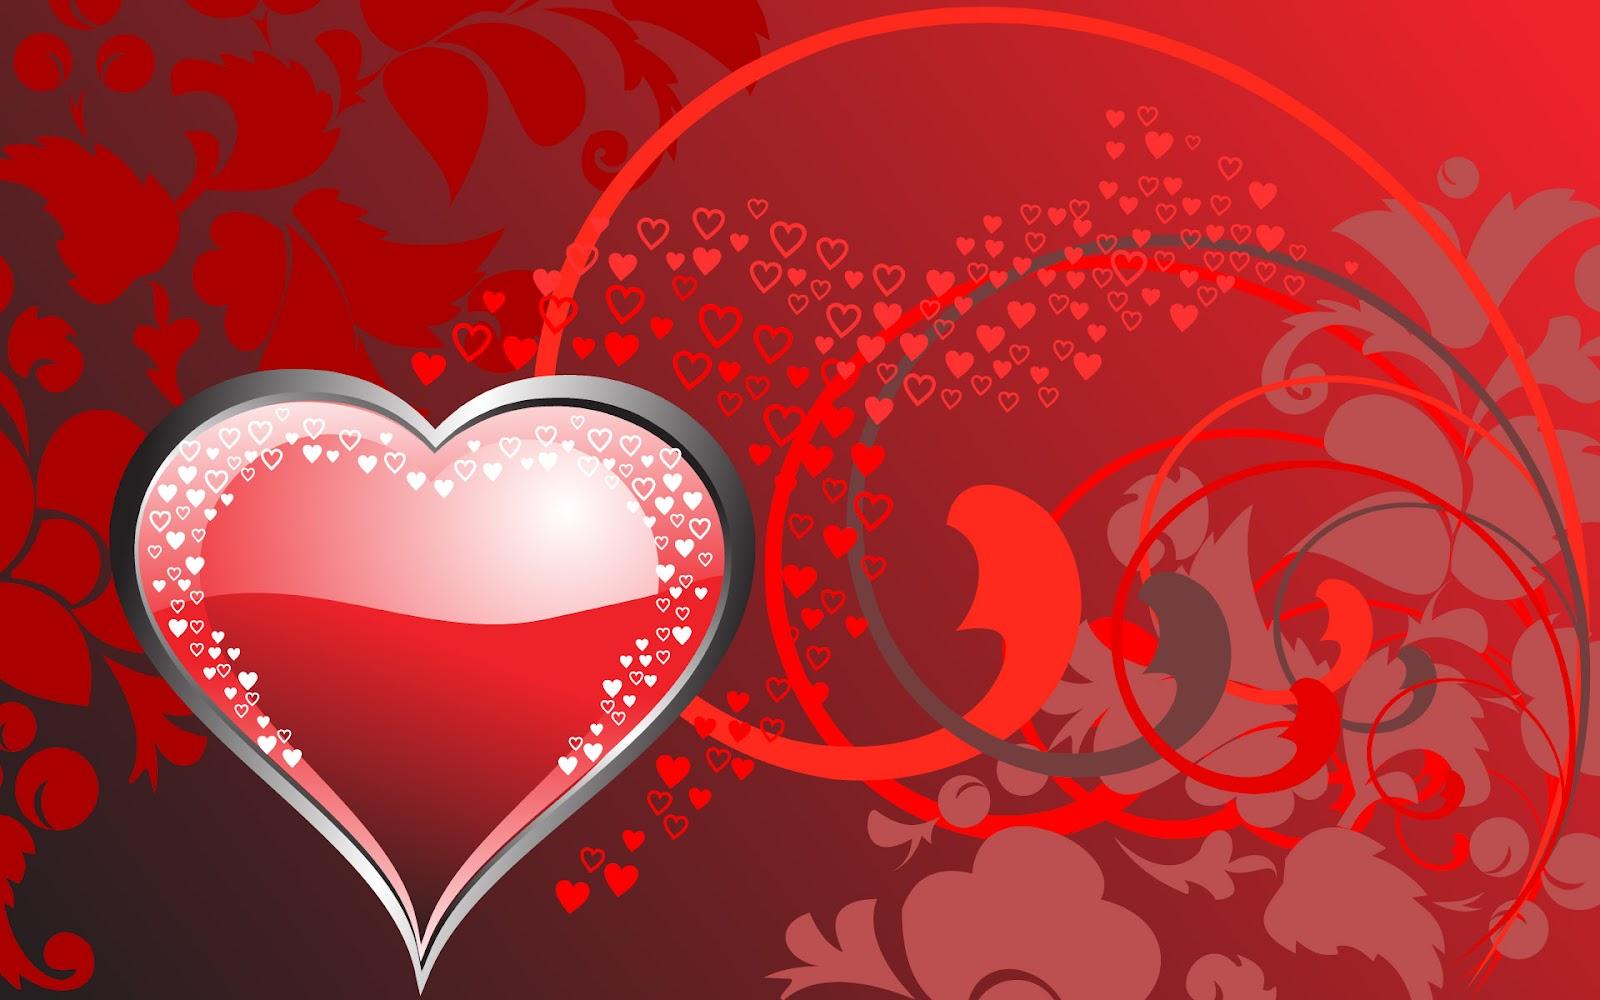 New love photos wallpaper, new love wallpaper | Amazing Wallpapers